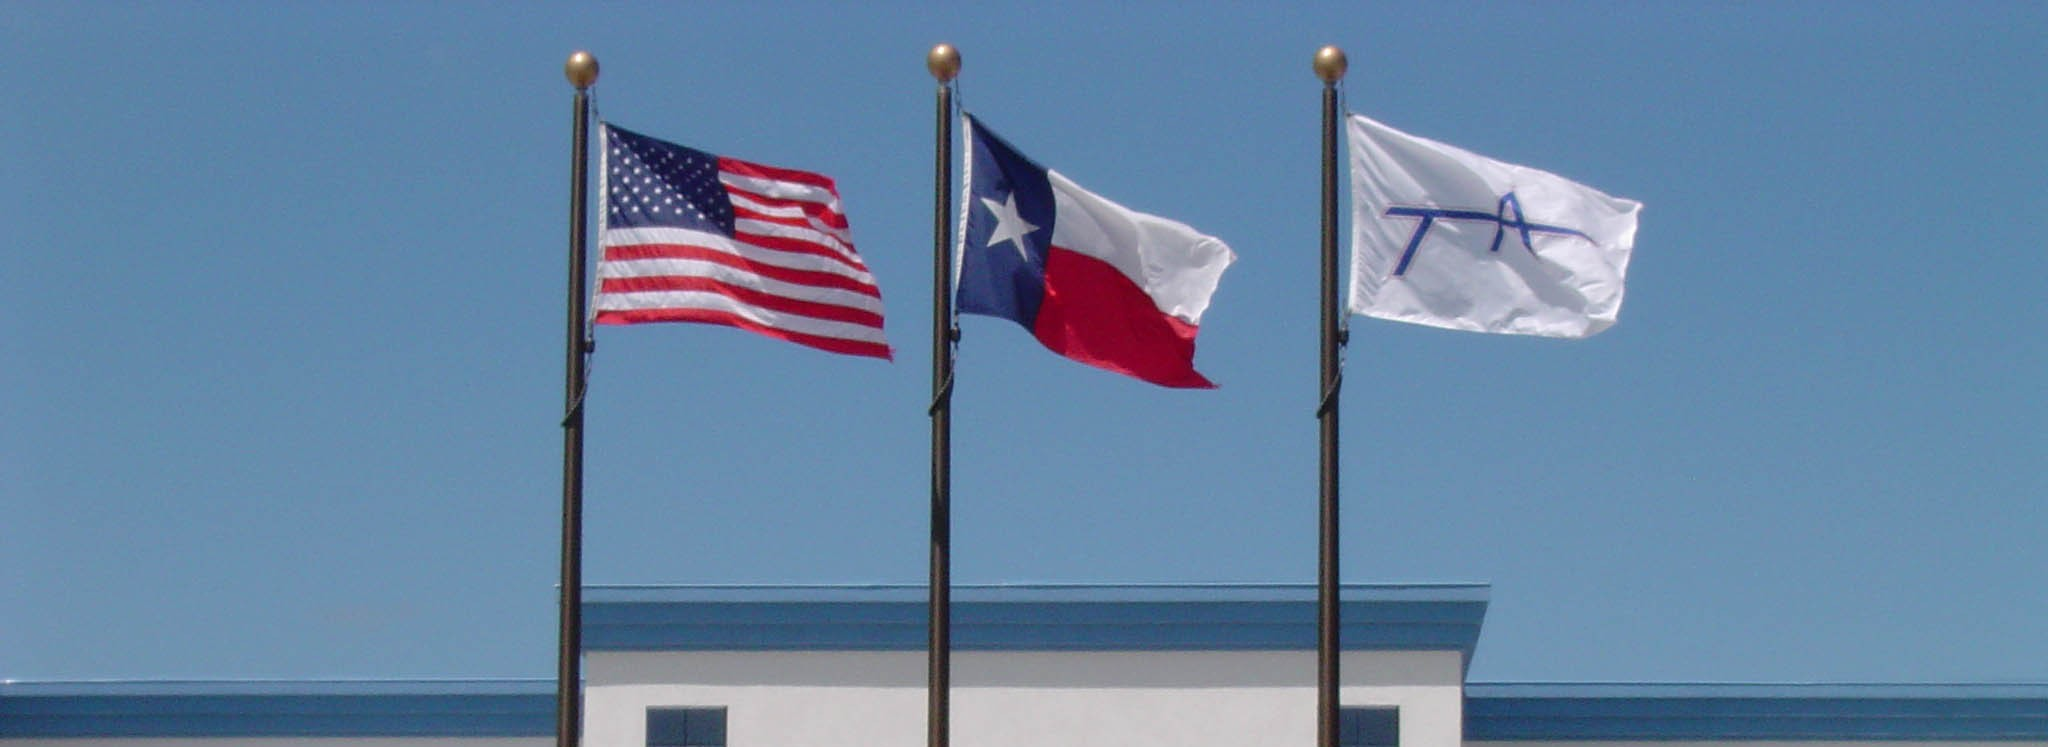 TEAM AMERICA INDUSTRIAL CONSTRUCTION external flags